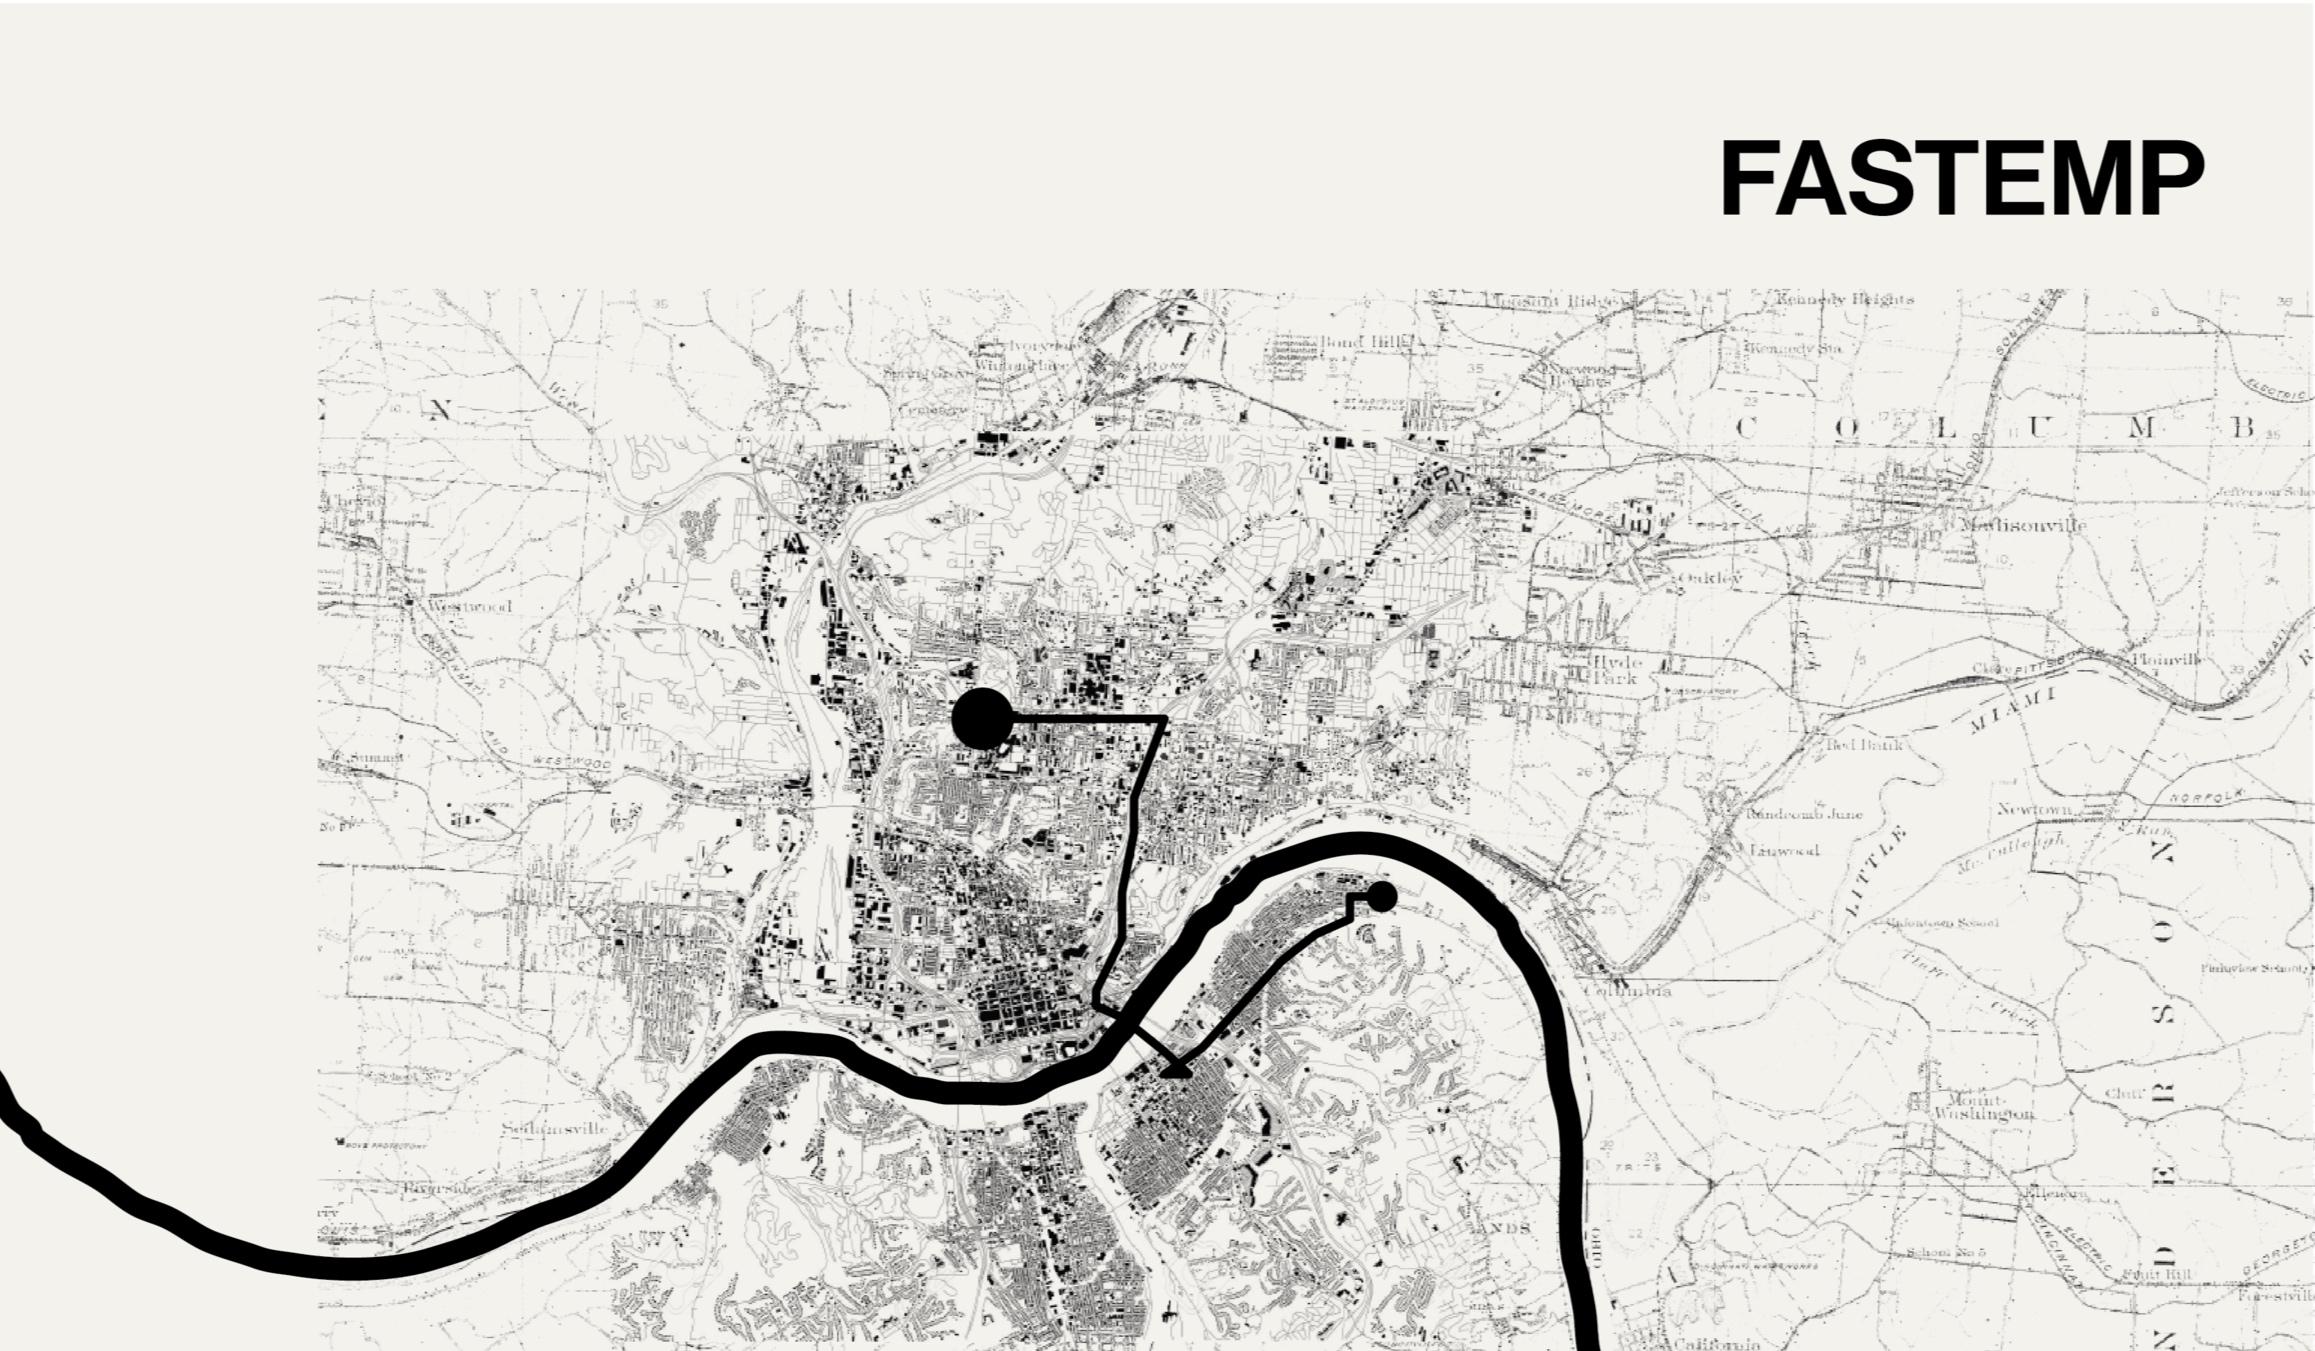 Map-Fastemp.jpg